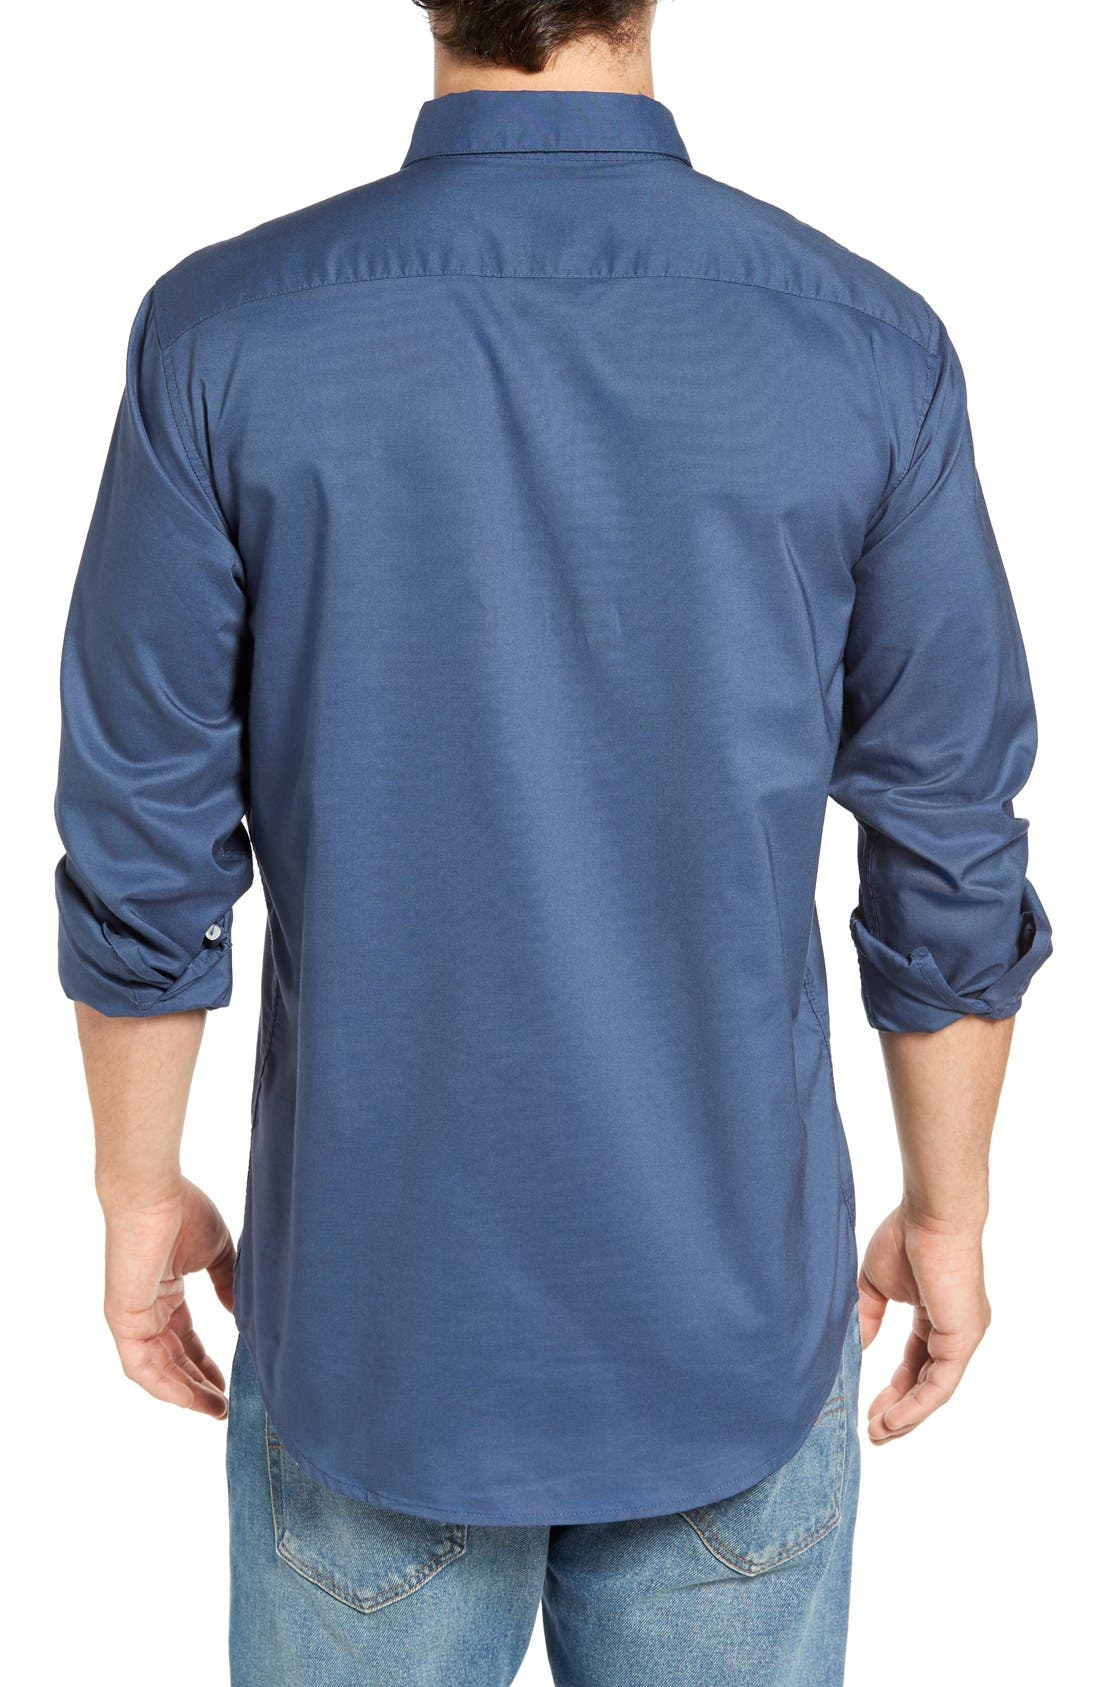 Alternate Image 2  - RVCA 'That'll Do' Slim Fit Oxford Shirt